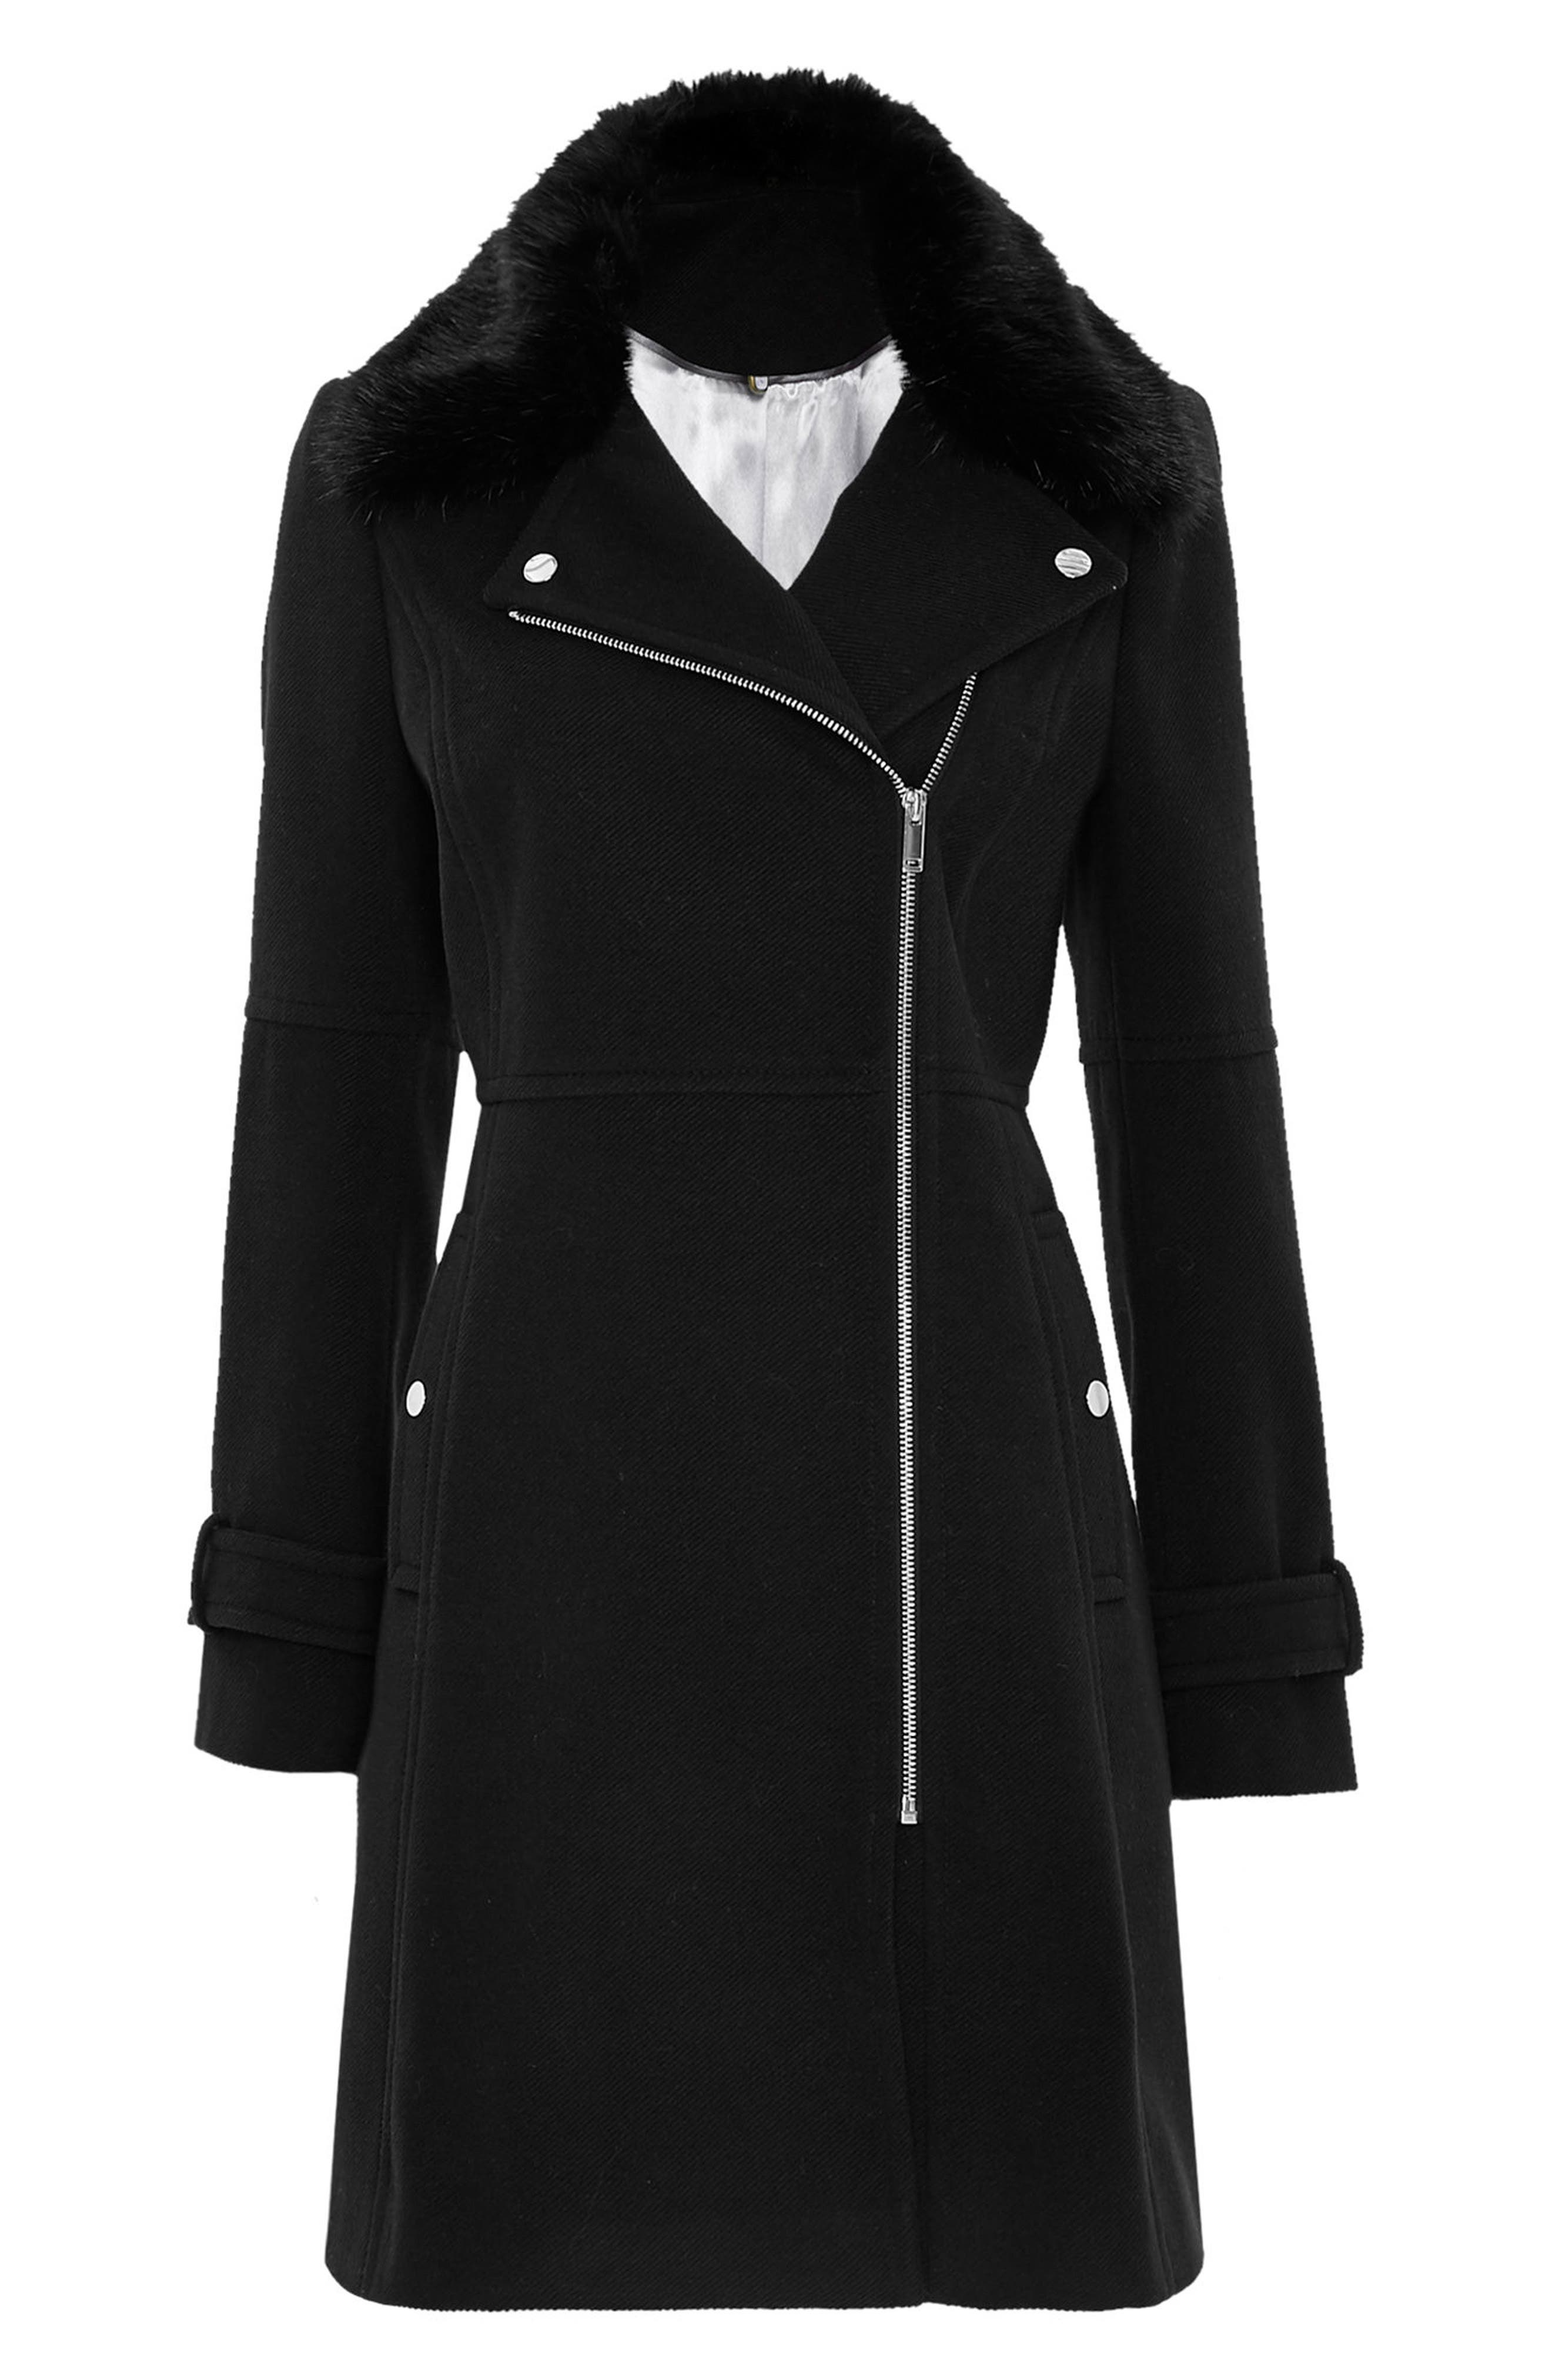 Twill Biker Jacket with Faux Fur Collar,                             Alternate thumbnail 4, color,                             Black